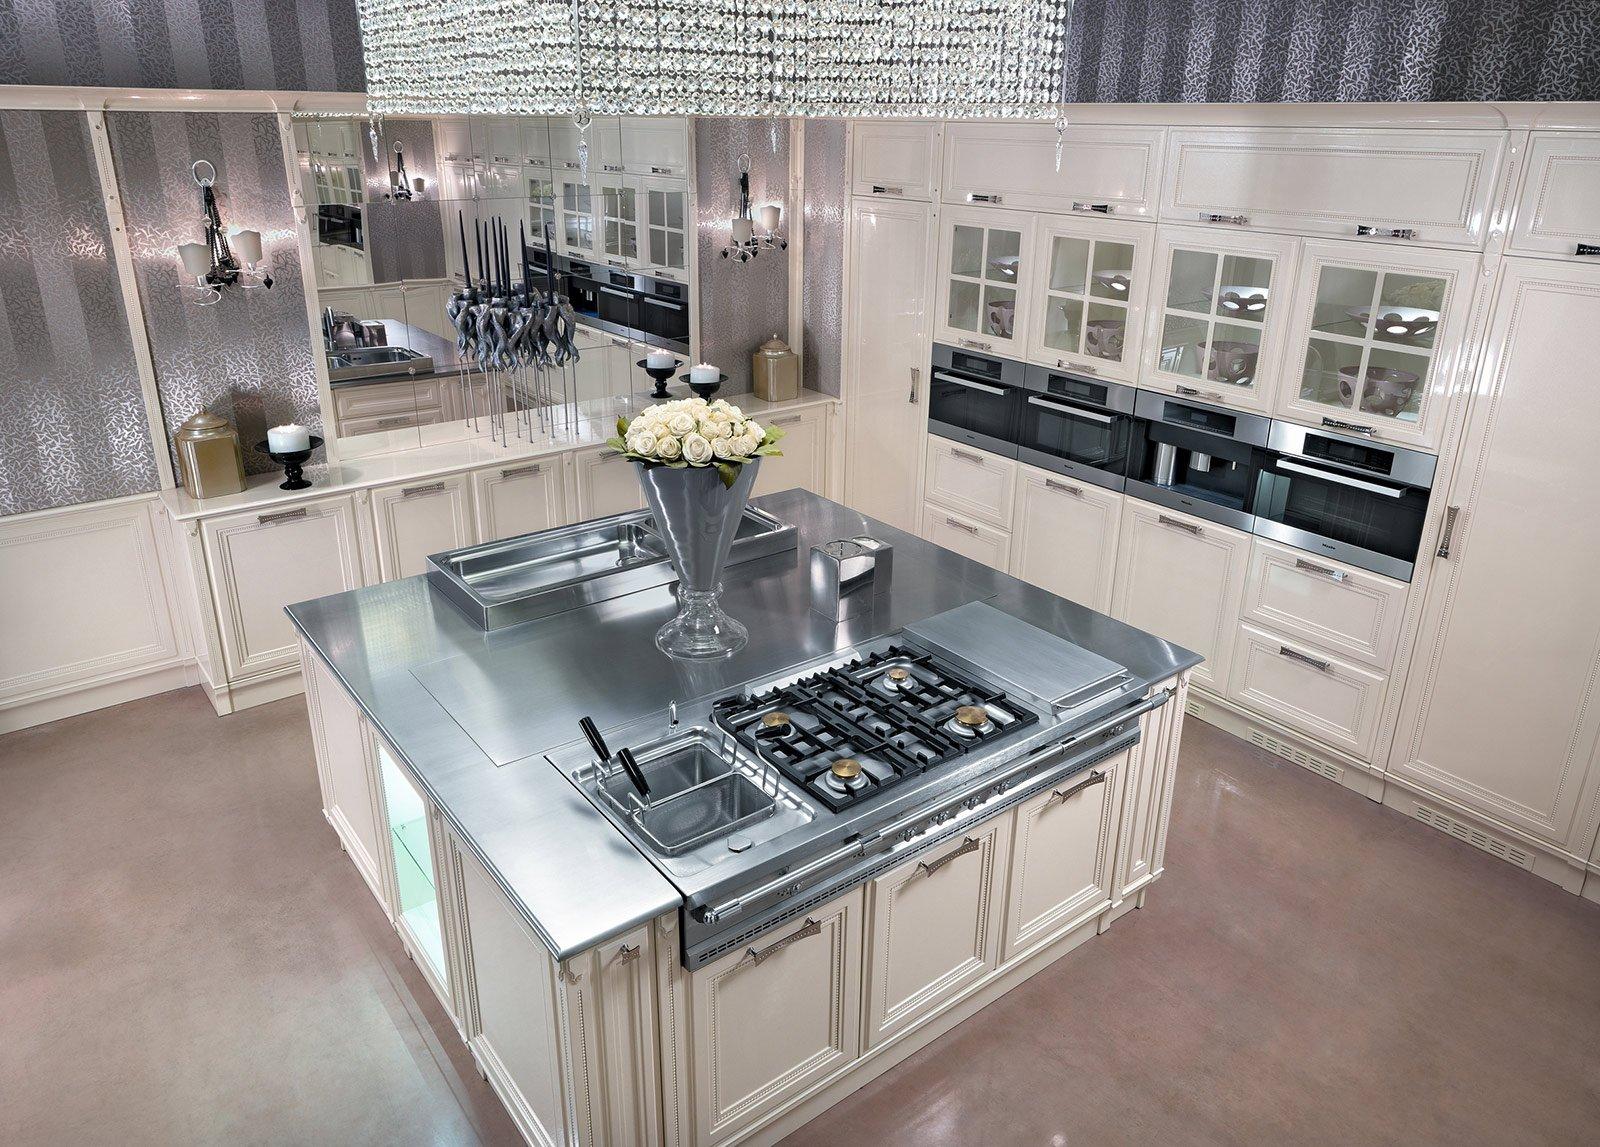 Cucine in stile cose di casa for Piani di casa unici in stile ranch